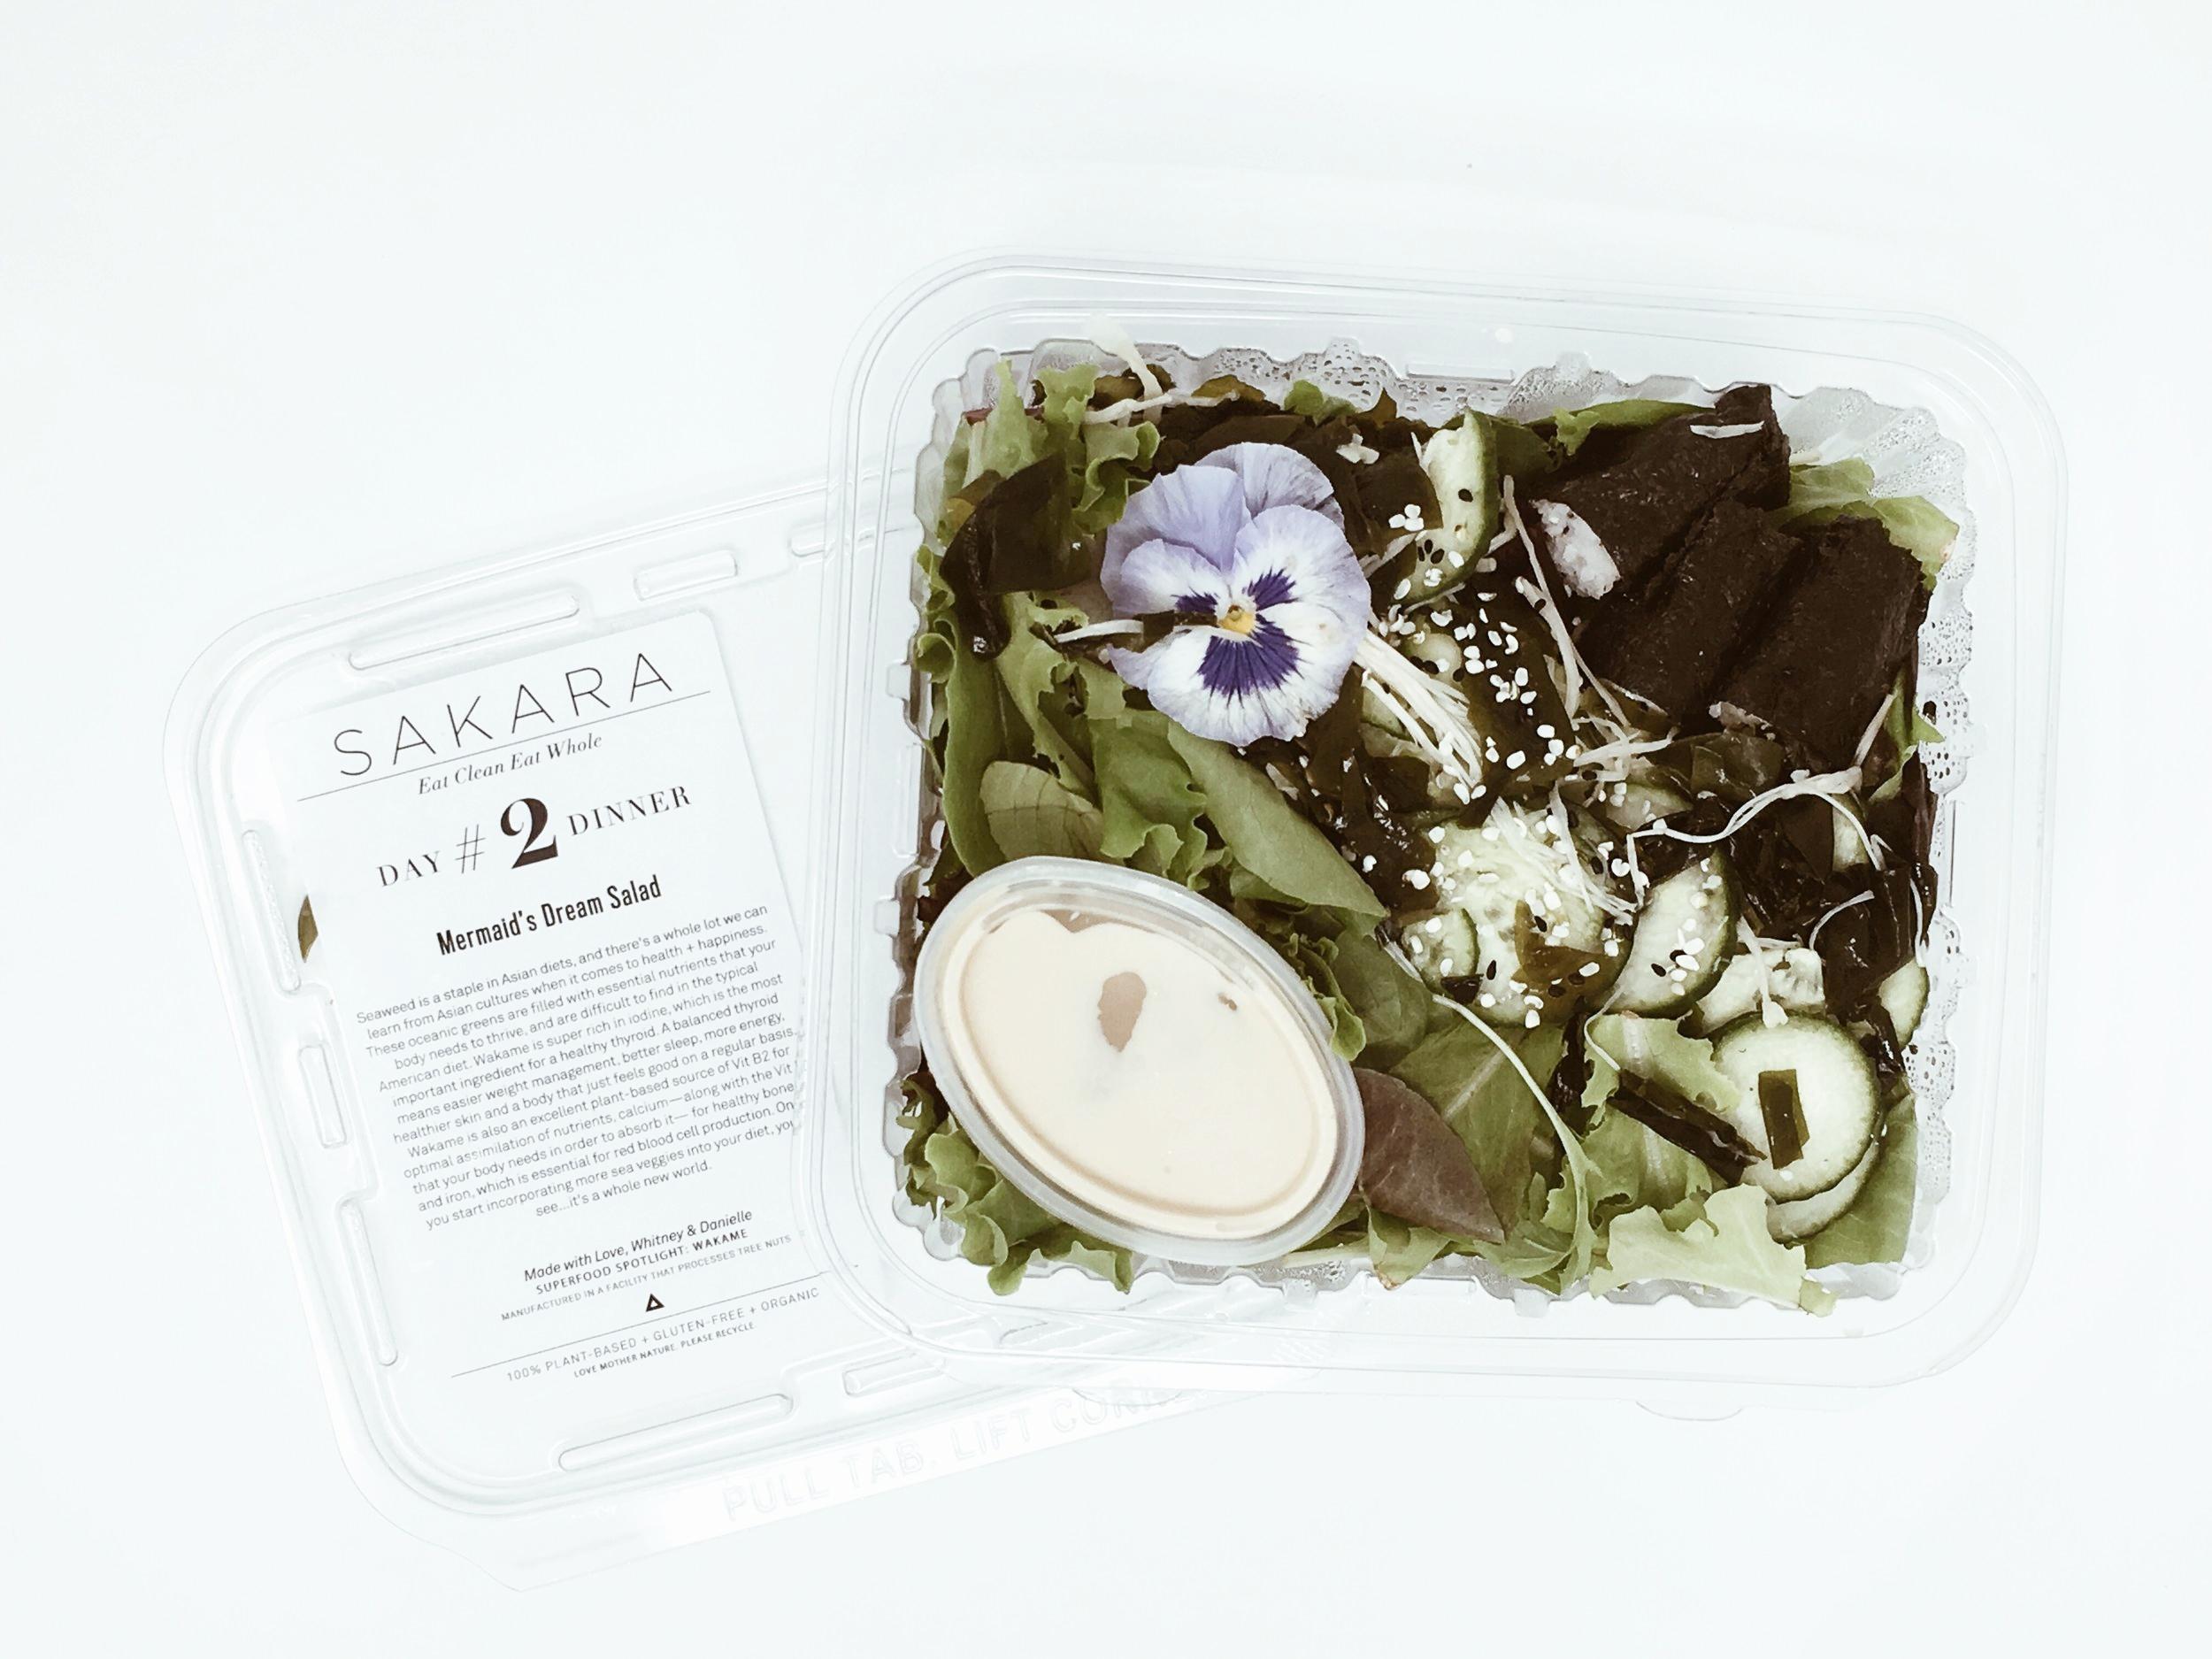 mermaids dream salad sakara menu